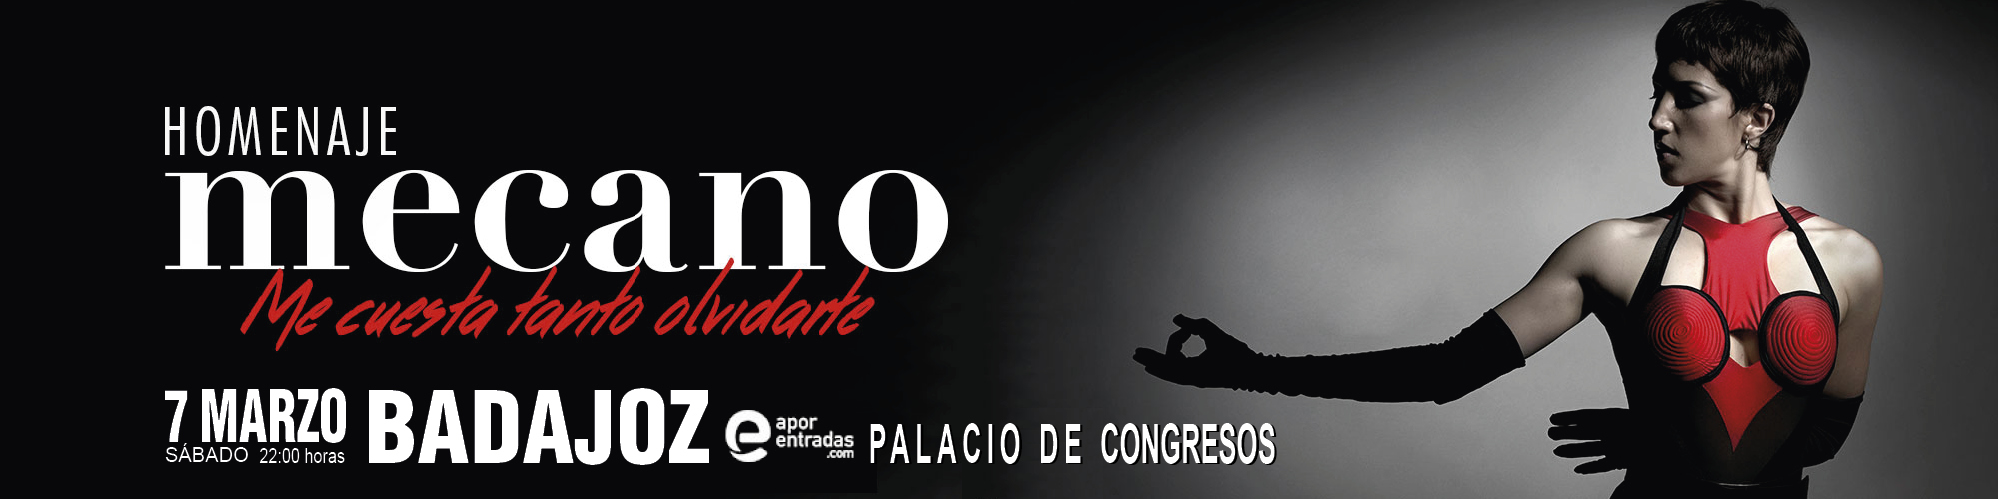 Mecano Badajoz